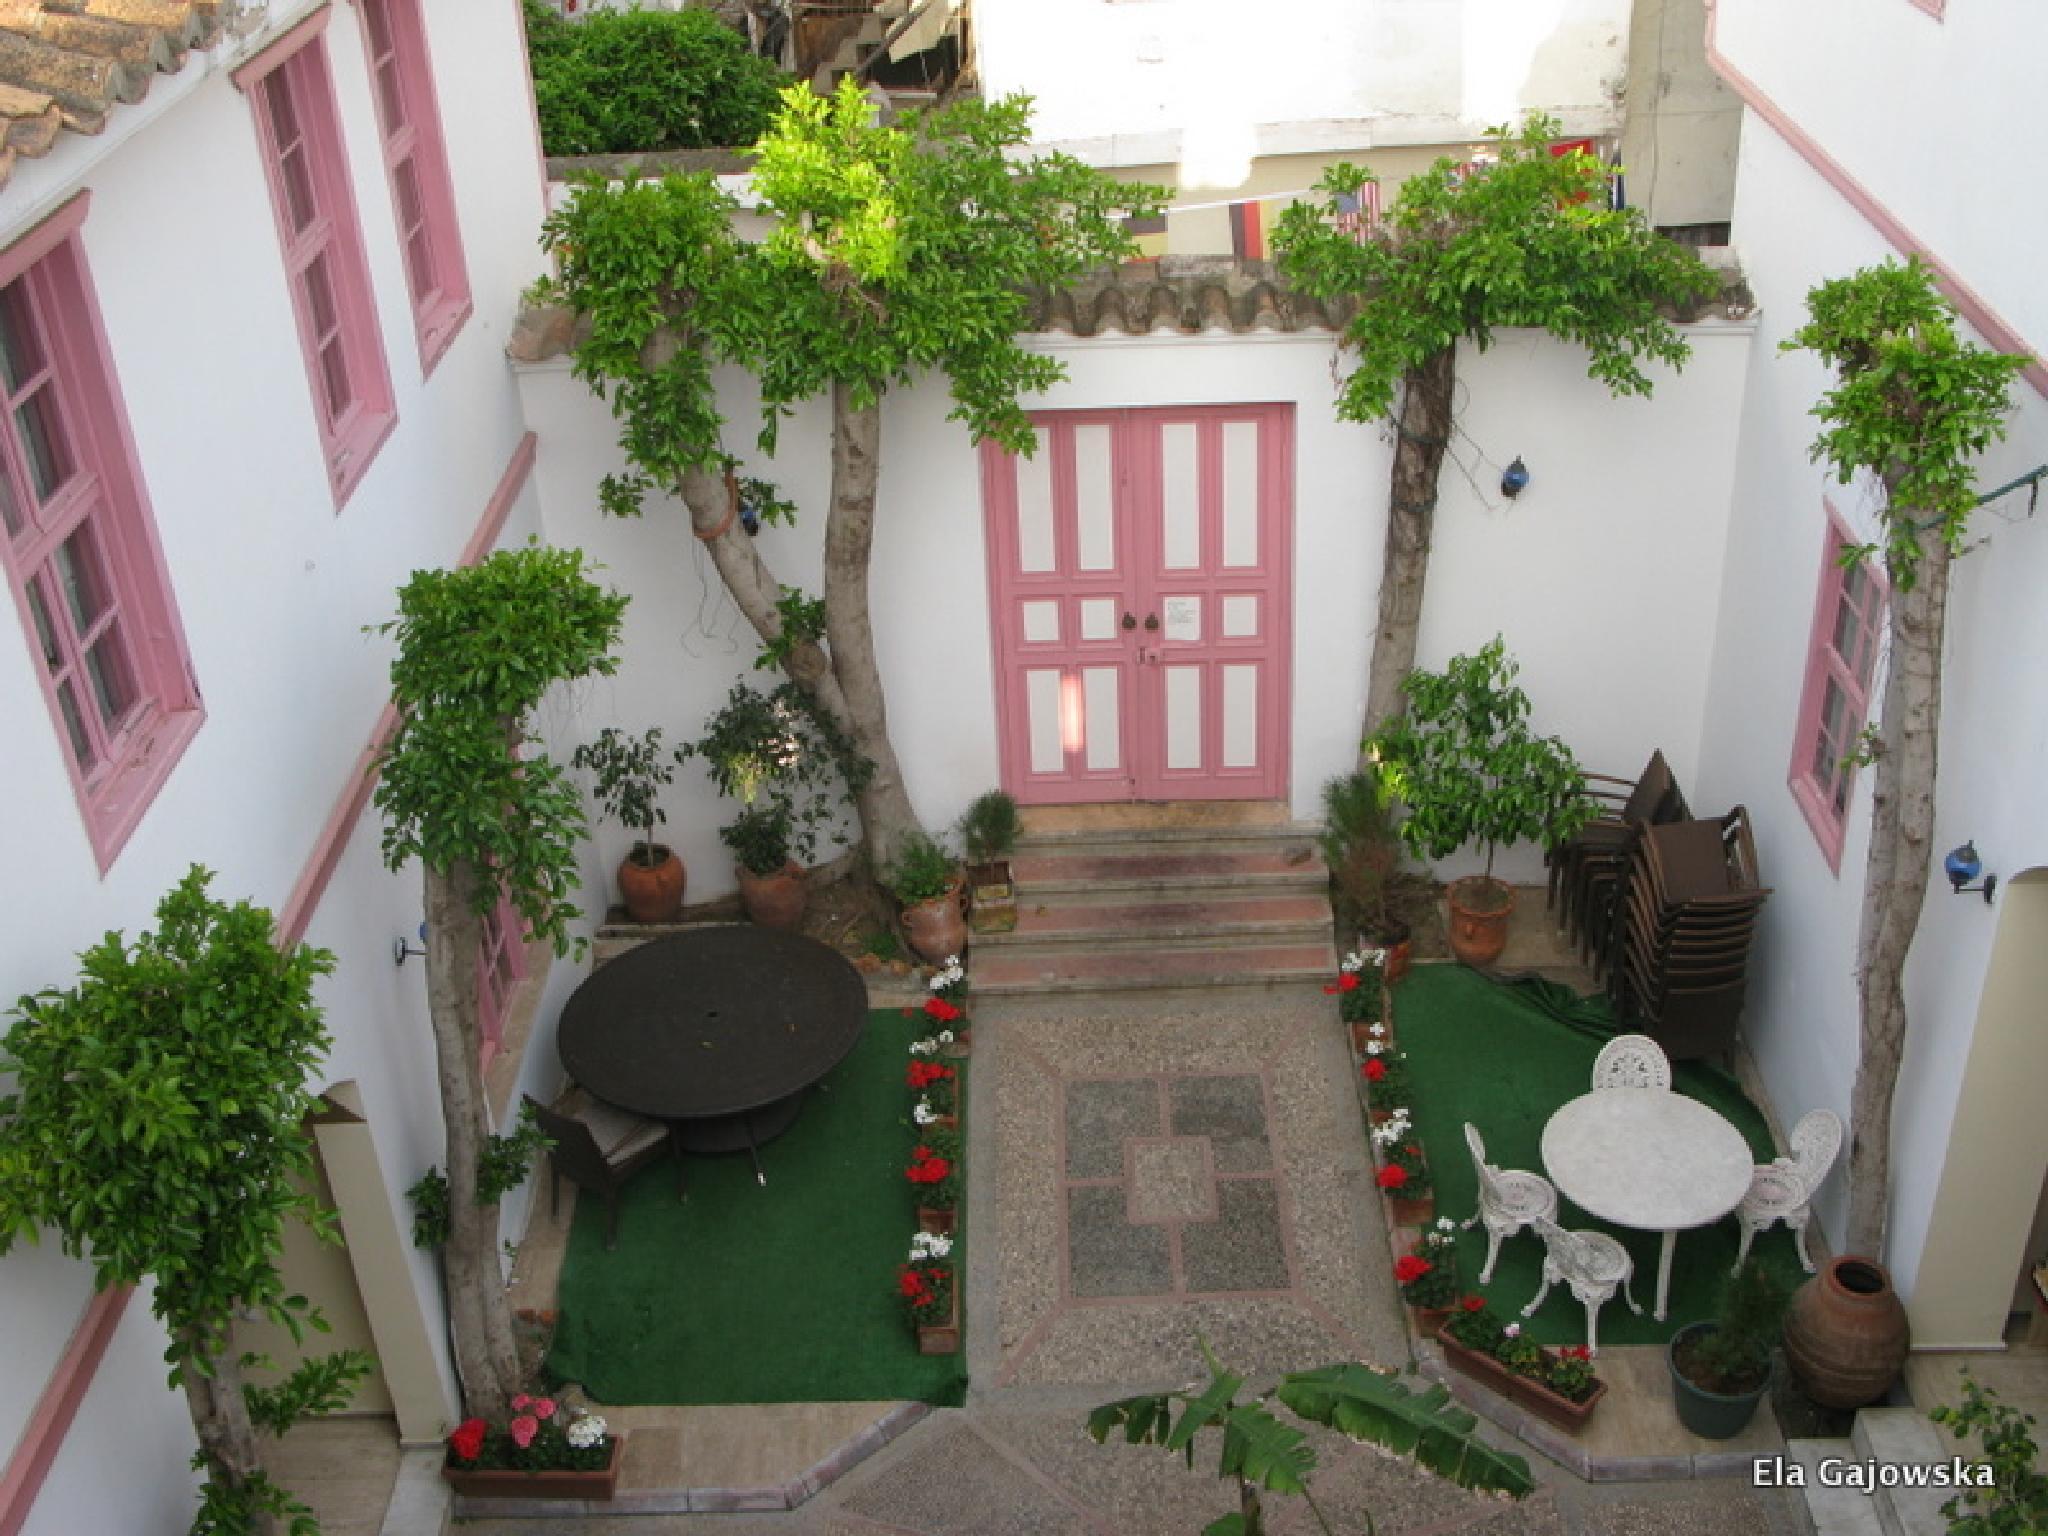 A patio in Antalya by Ela Gajowska